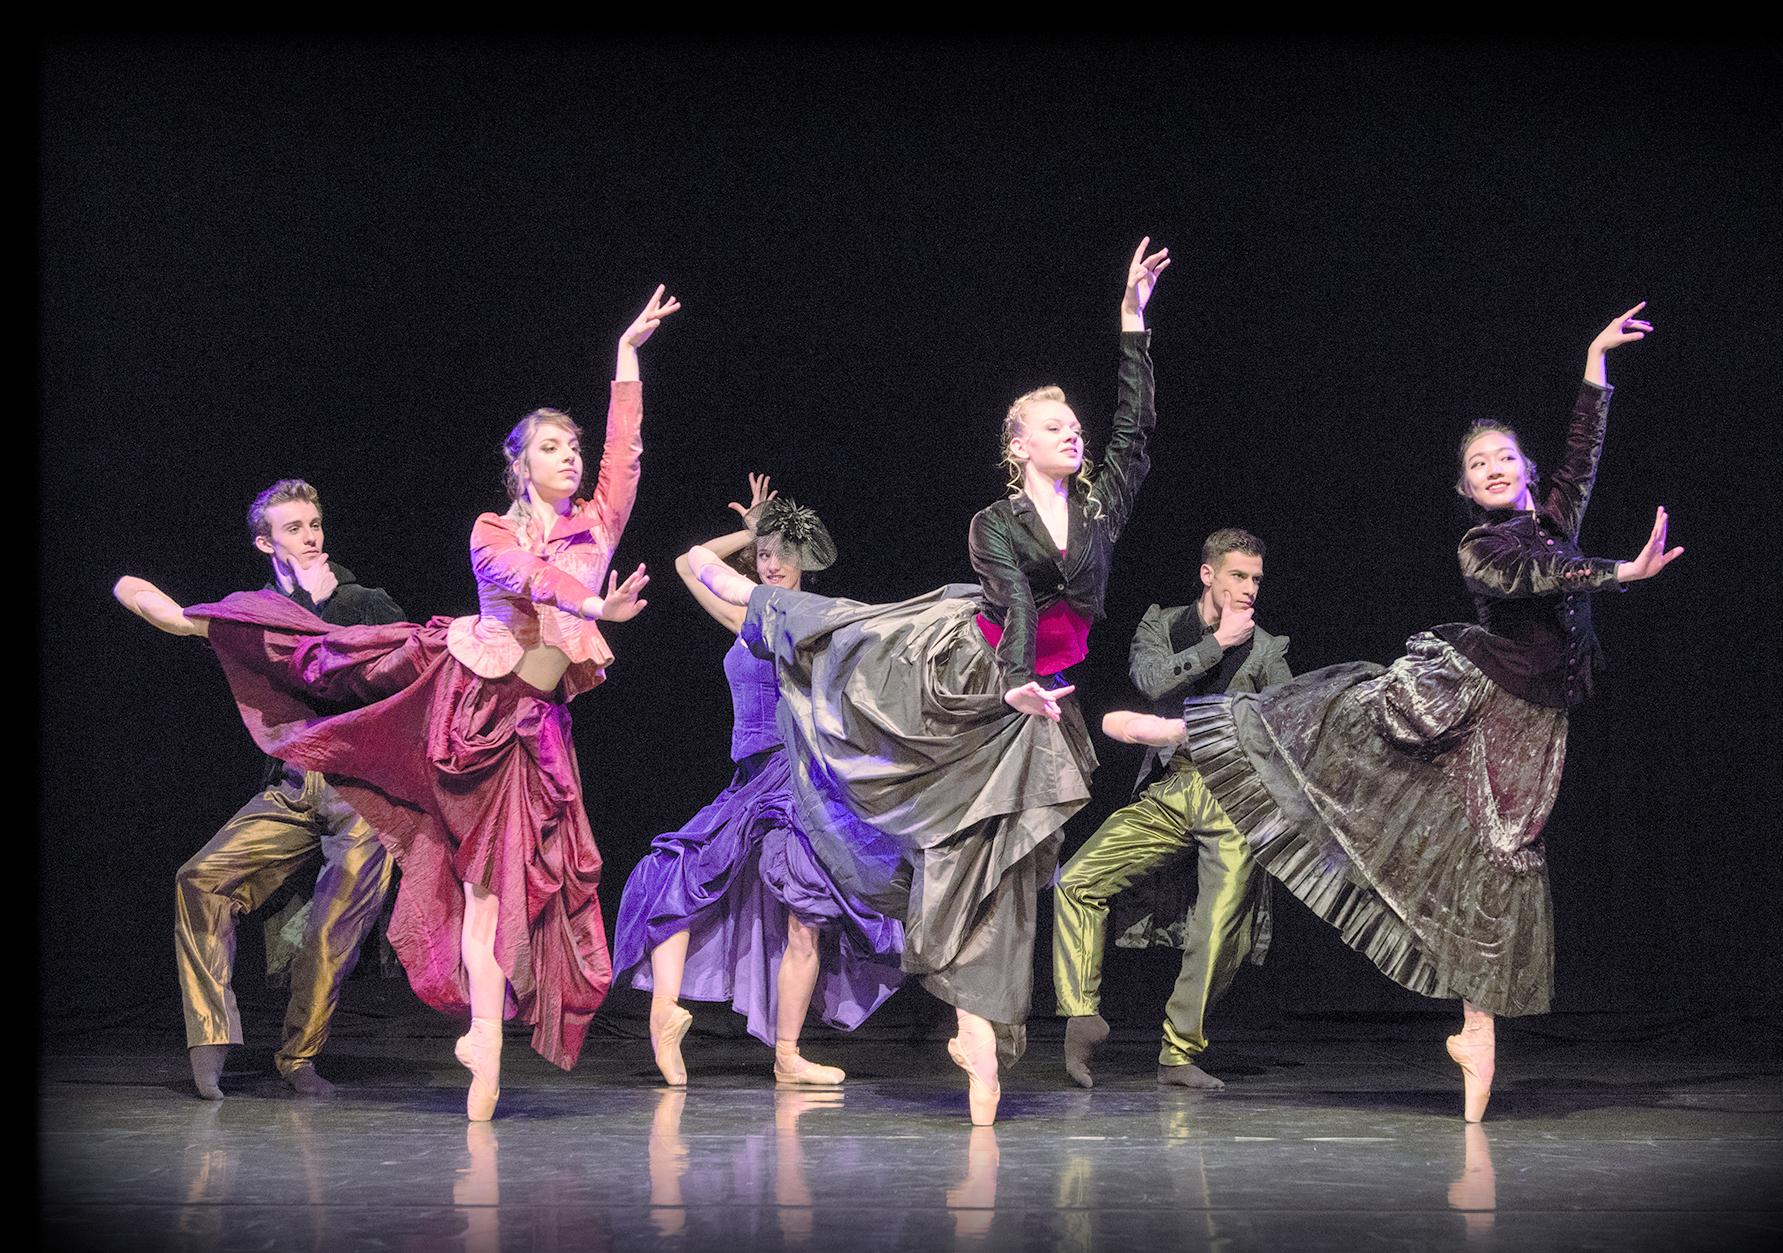 Delattre Dance Company: Das Bildnis des Dorian Gray